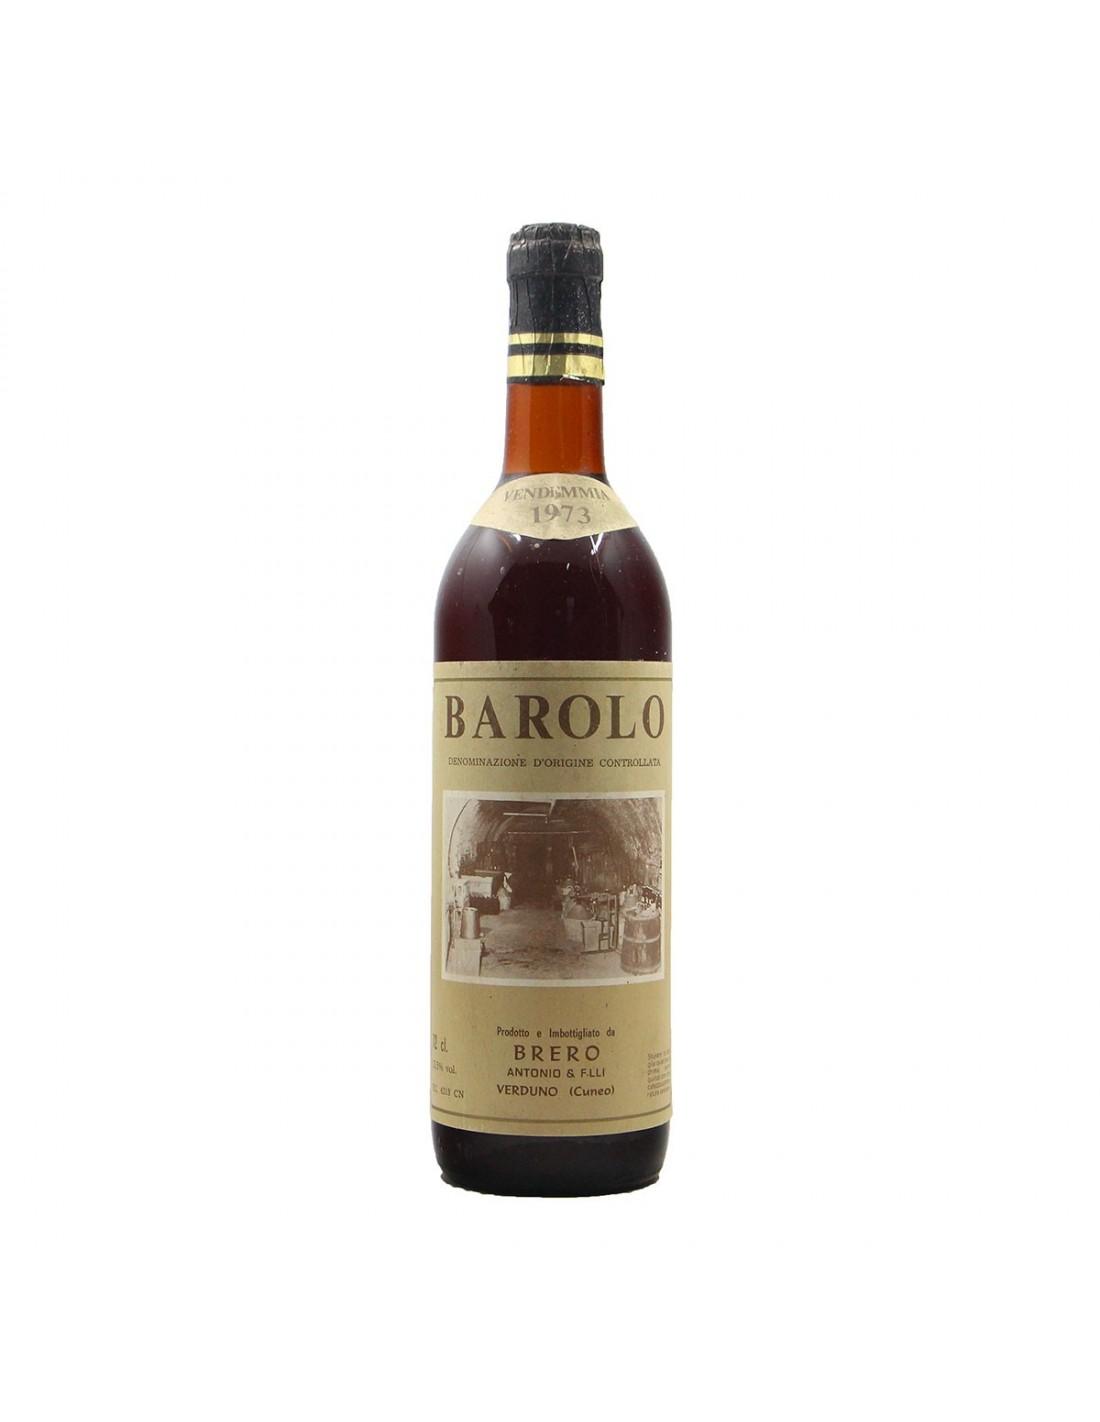 Barolo 1973 BRERO GRANDI BOTTIGLIE